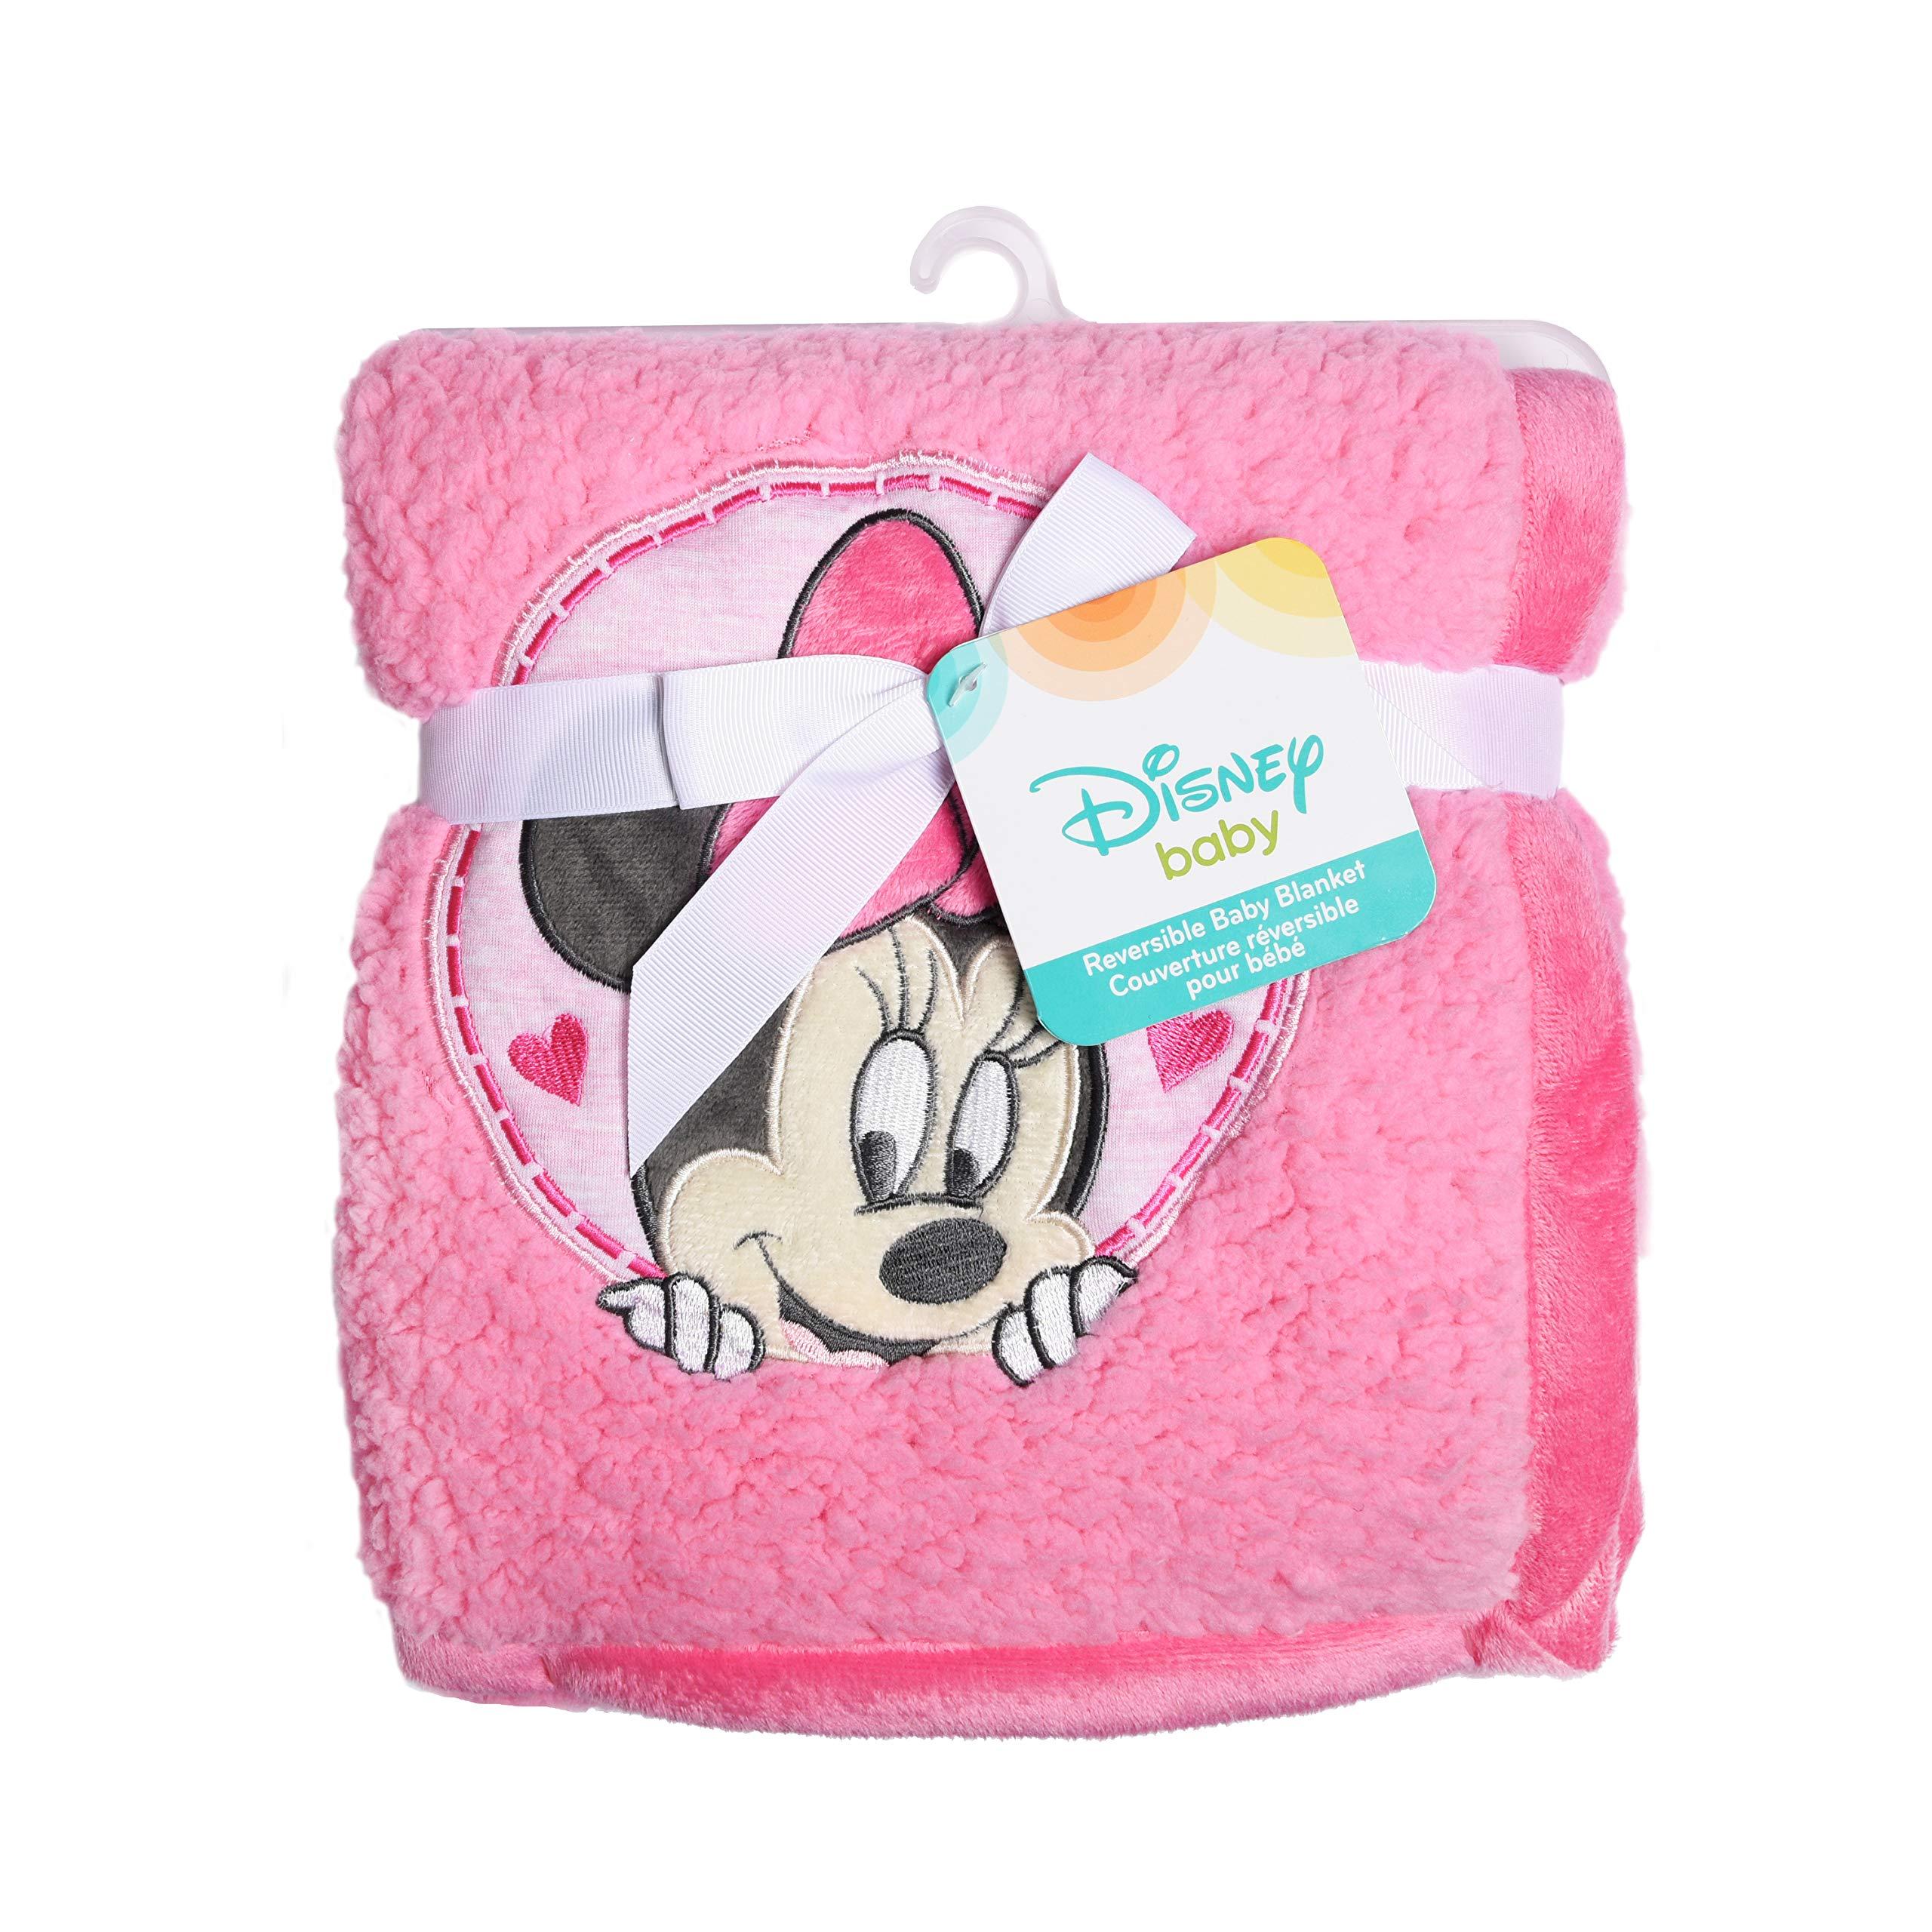 Dumbo 35711 Disney Jersey Knit Baby Blanket